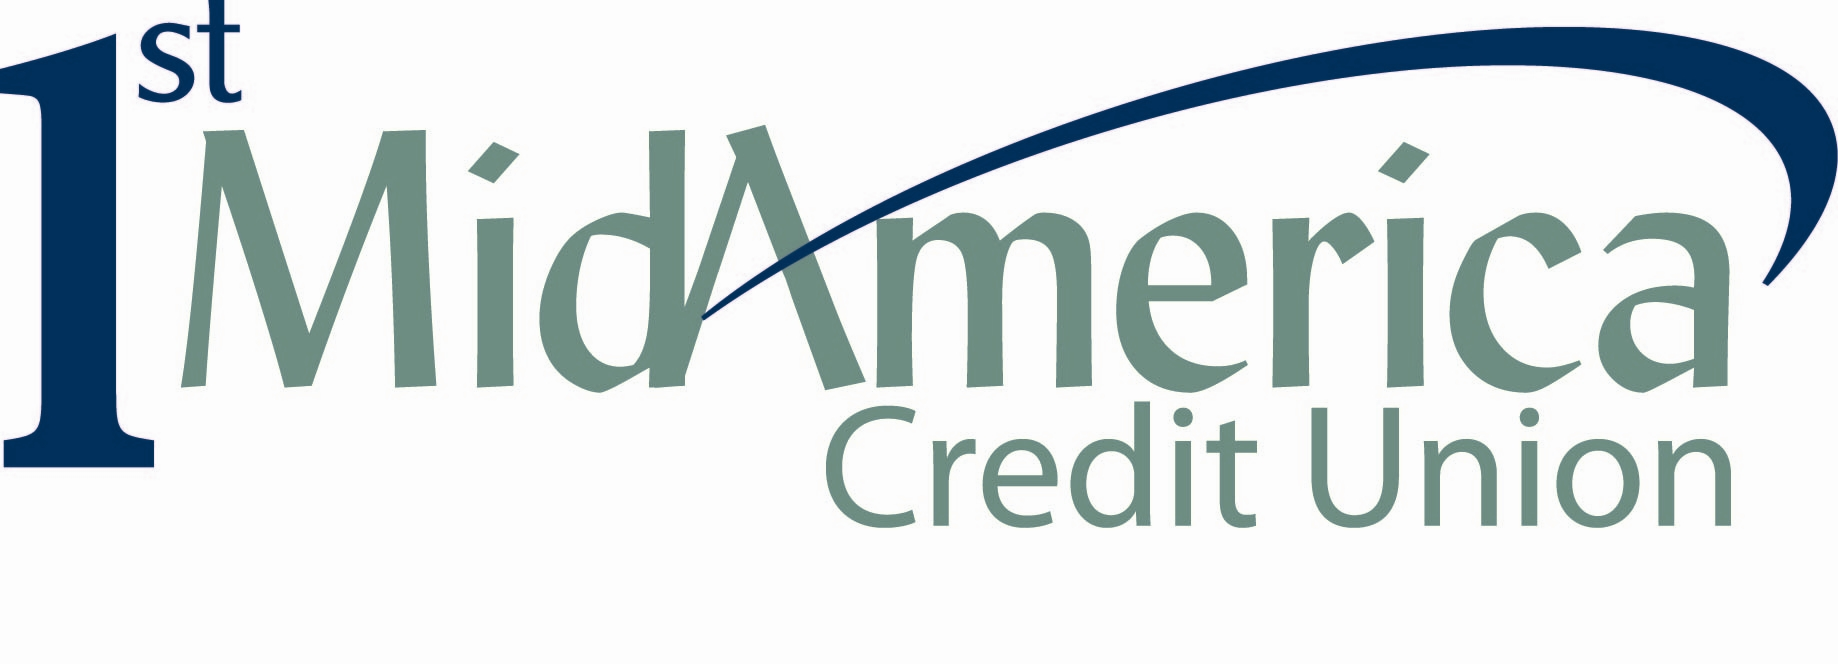 1st Midamerica Credit Union Kasasa Tunes Checking Account 140 Bonus